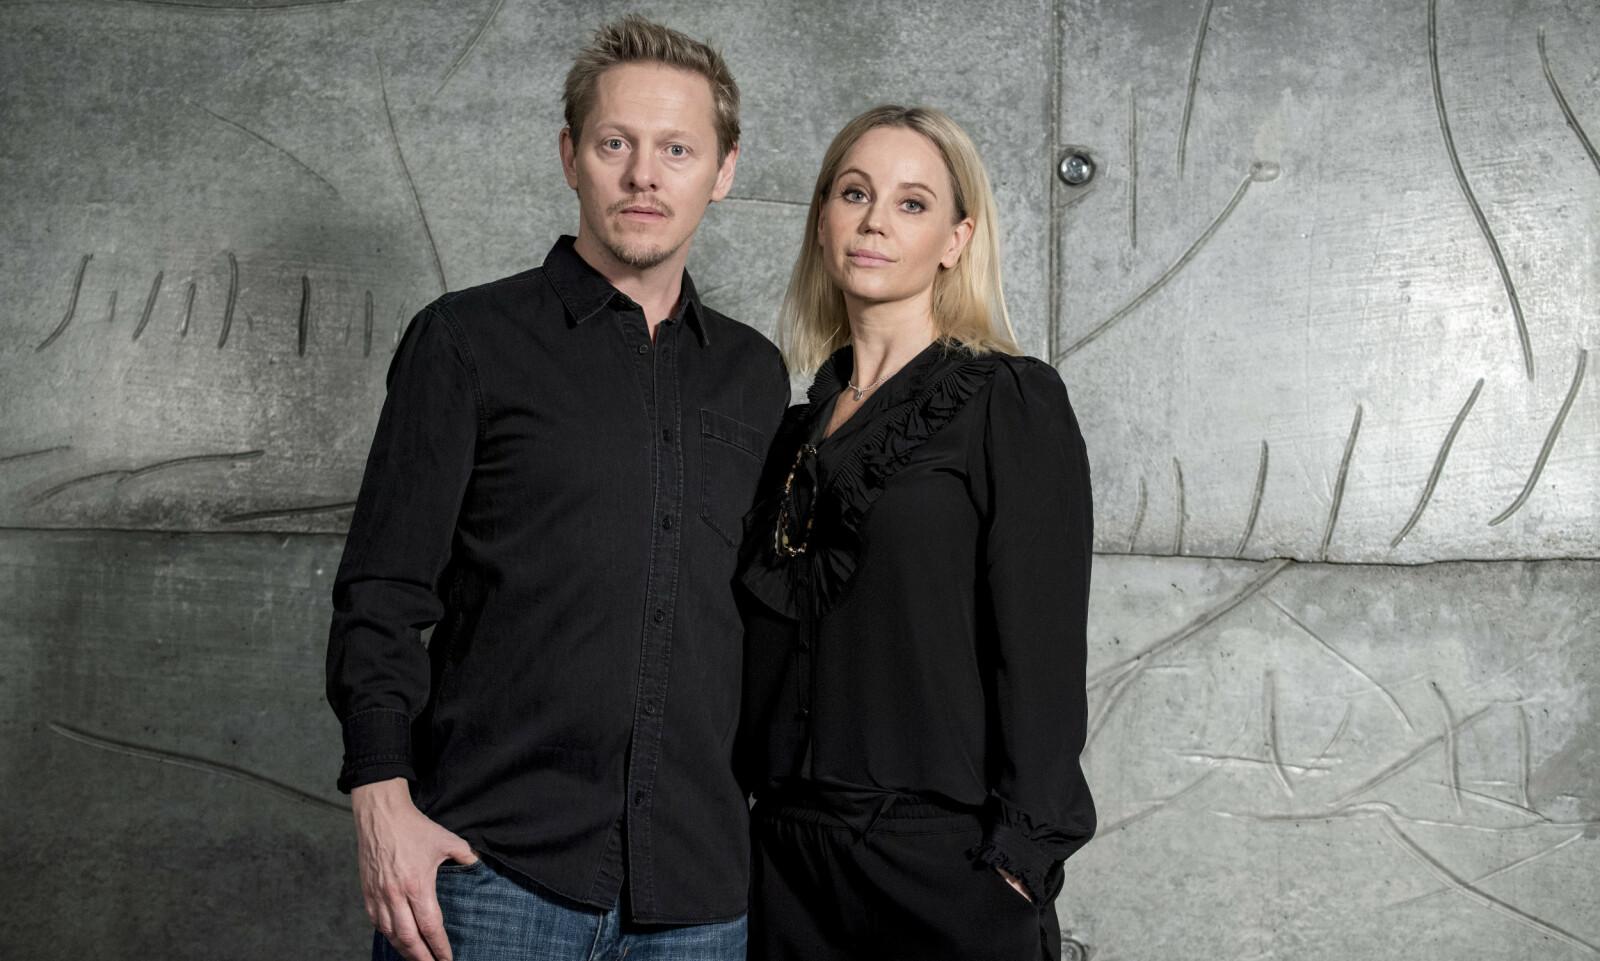 BROEN: Her i Norge er Thure Lindhardt kanskje mest kjent for rollen som politietterforsker Henrik Sabroe i den populære TV-serien Broen. Han spilte med Sofia Helin, som spilte politietterforsker Saga Norén. FOTO: NTB